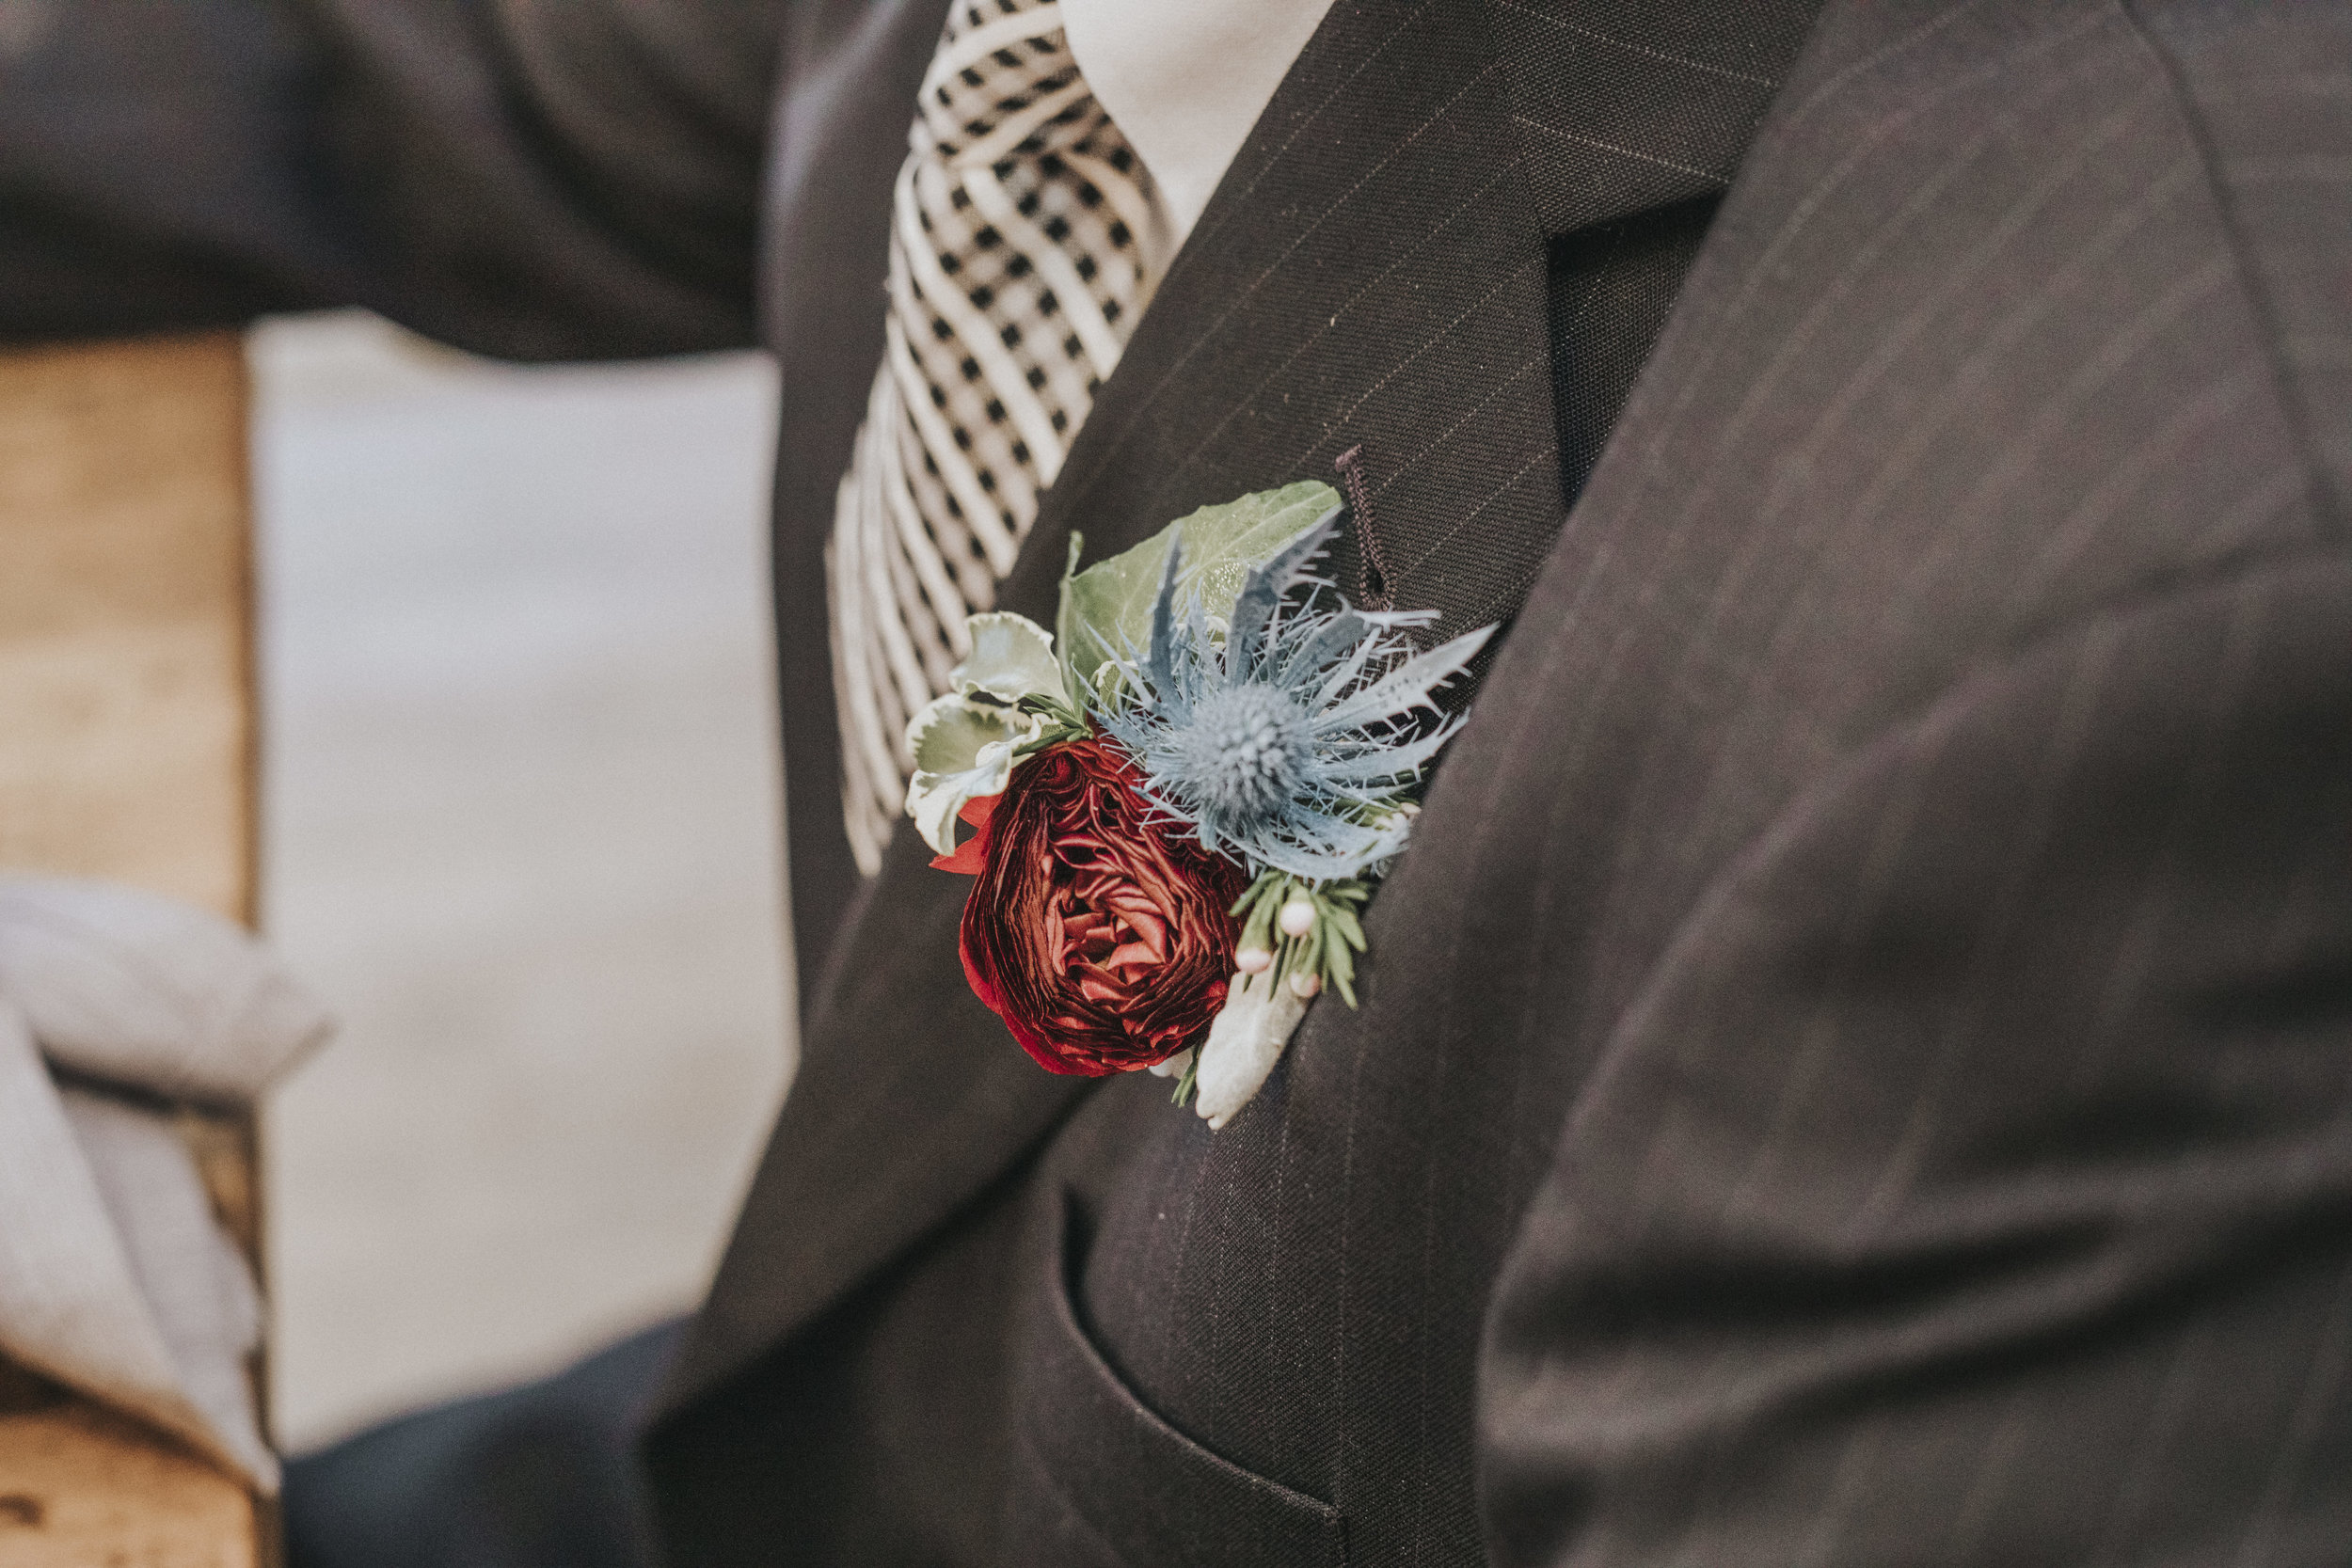 67 midwest-colorado-nebraska-elopement-photography-gretna-turtledoves.jpg